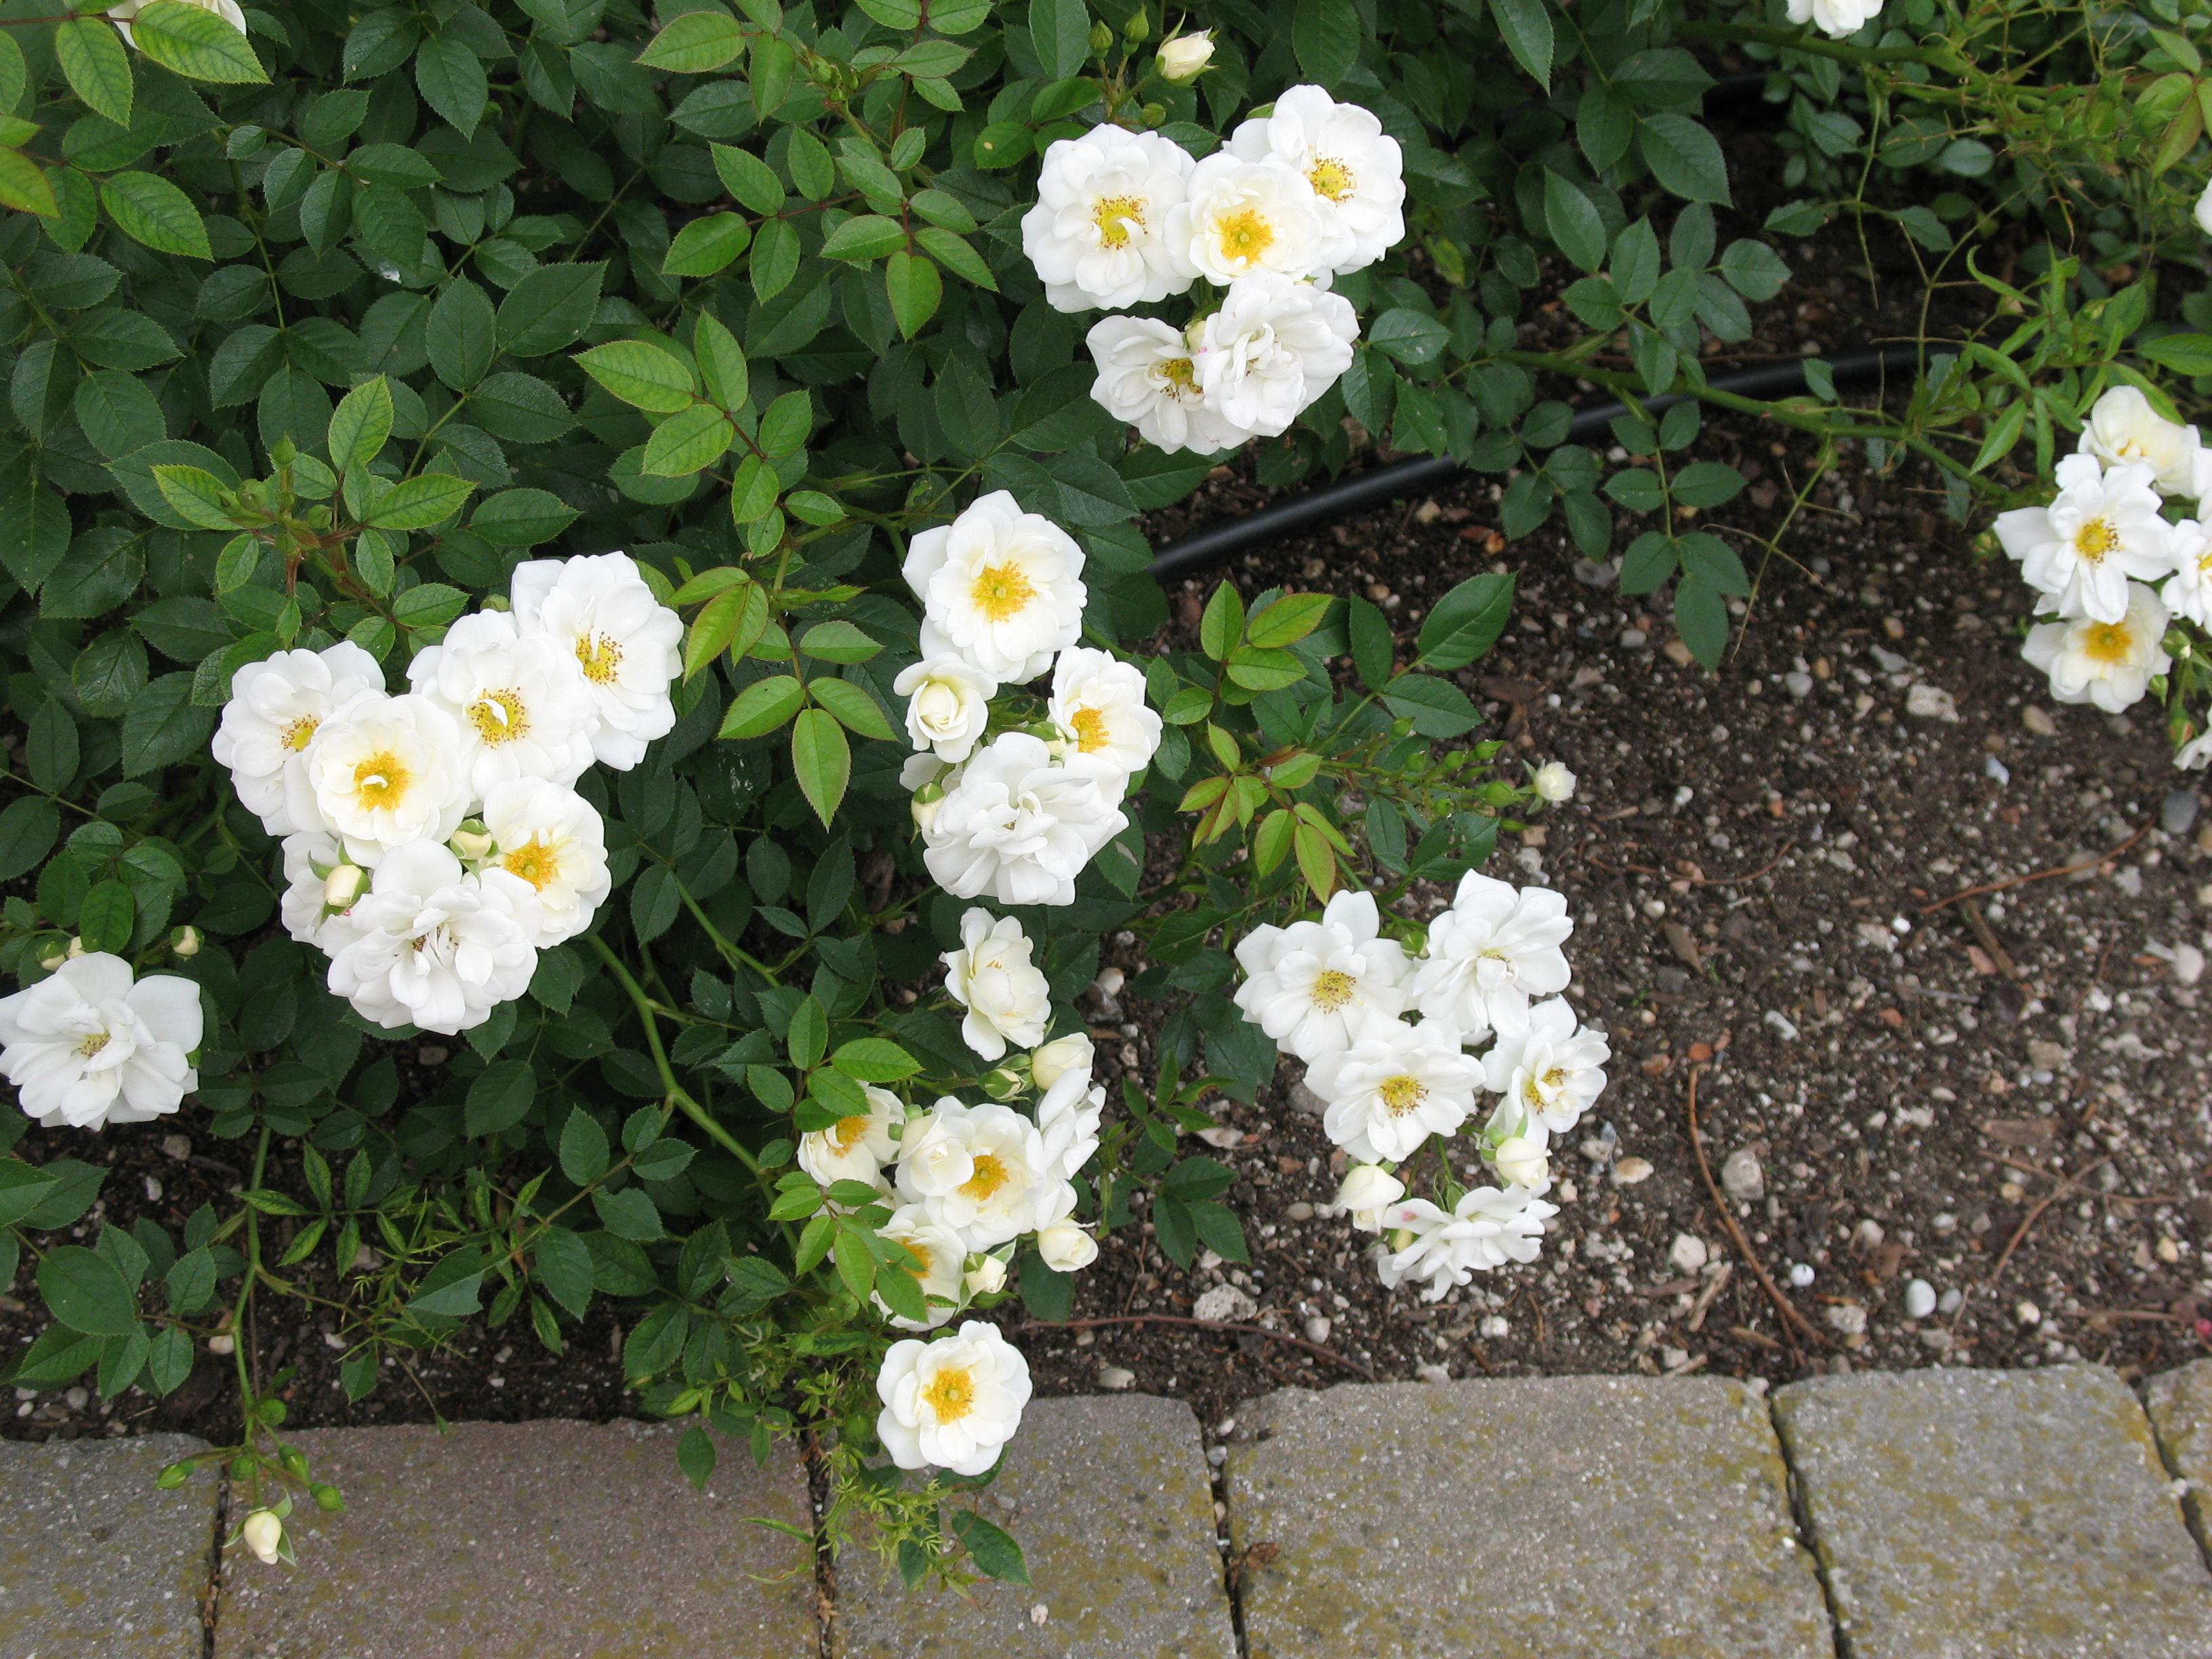 roses Pénélope avec leurs séduisantes étamines dorées